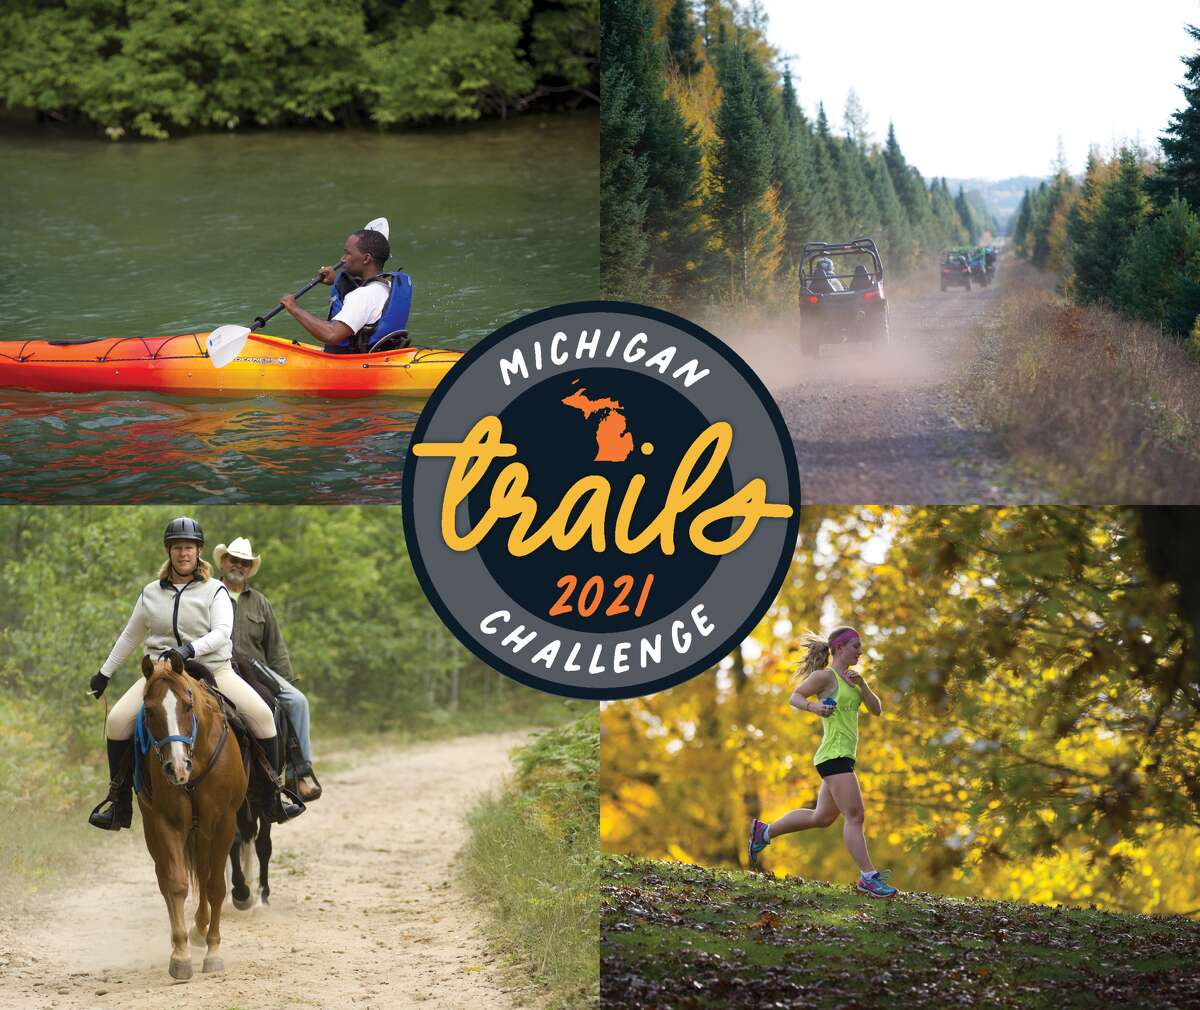 Michigan Trails Week Challenge starts Sept. 19 and ends Sept. 26.